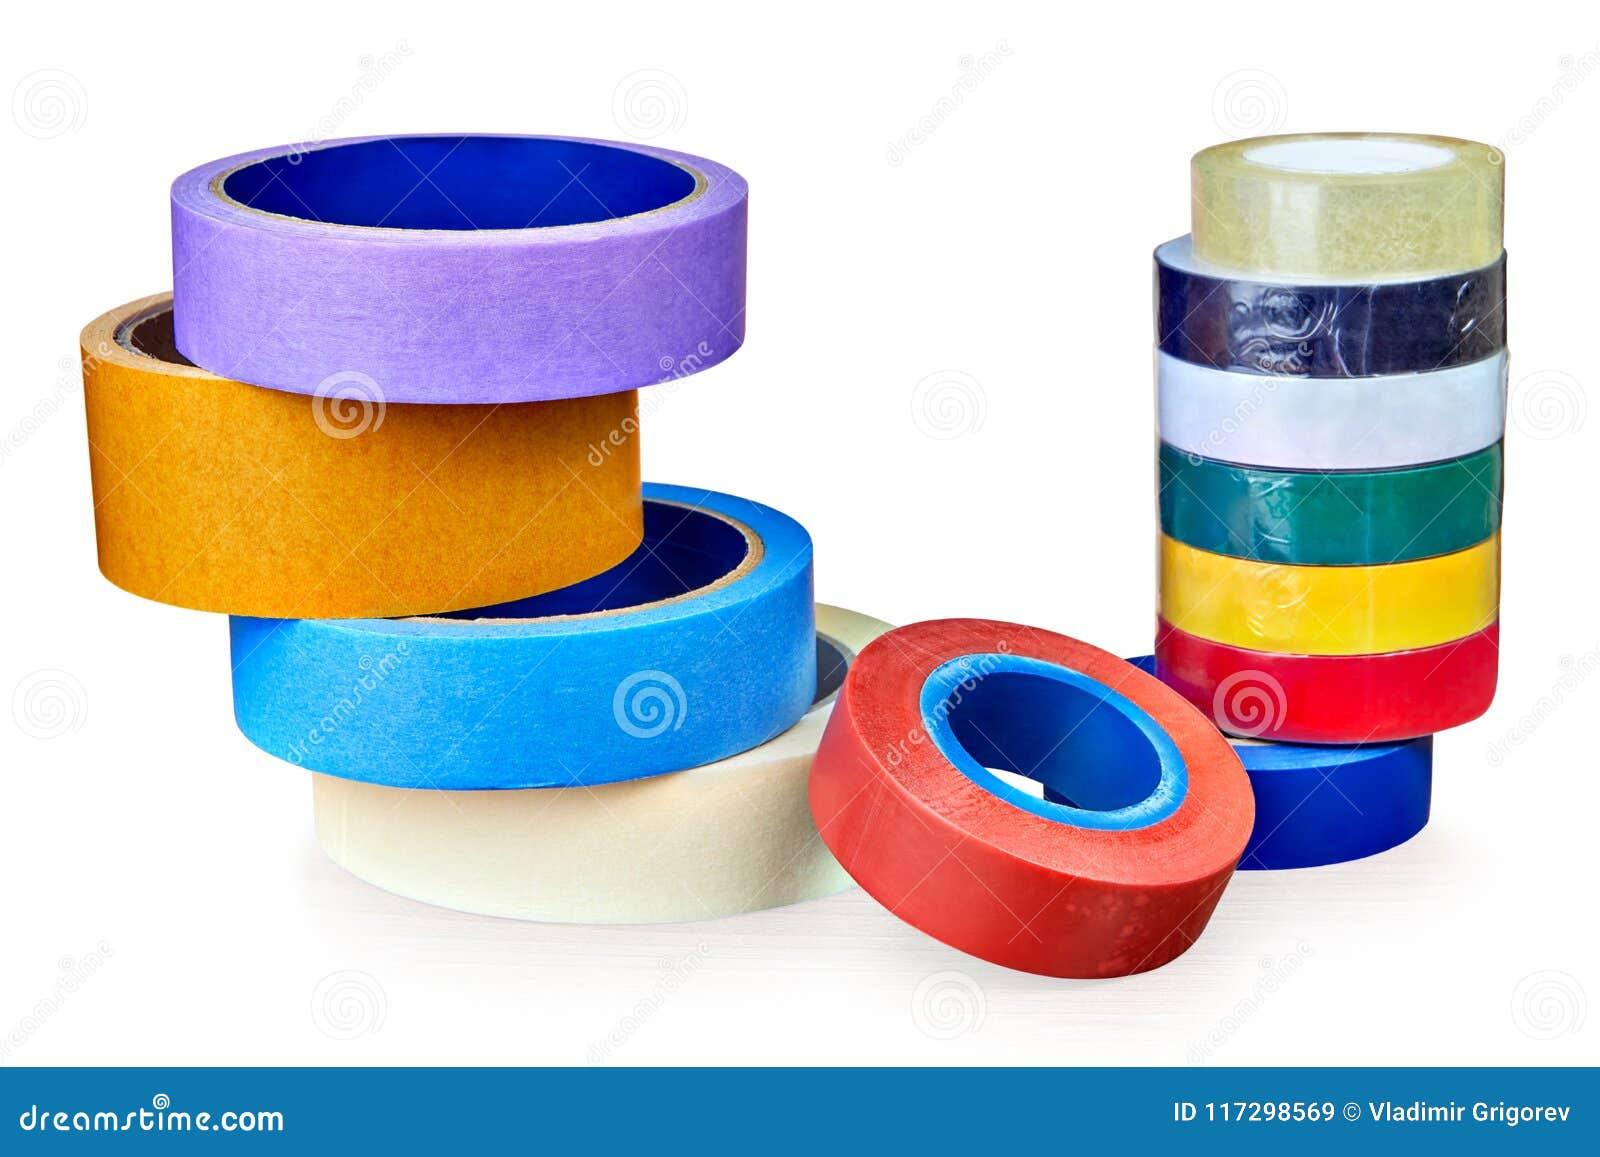 Duas pilhas de rolos da fita adesiva multi-colorida, no branco